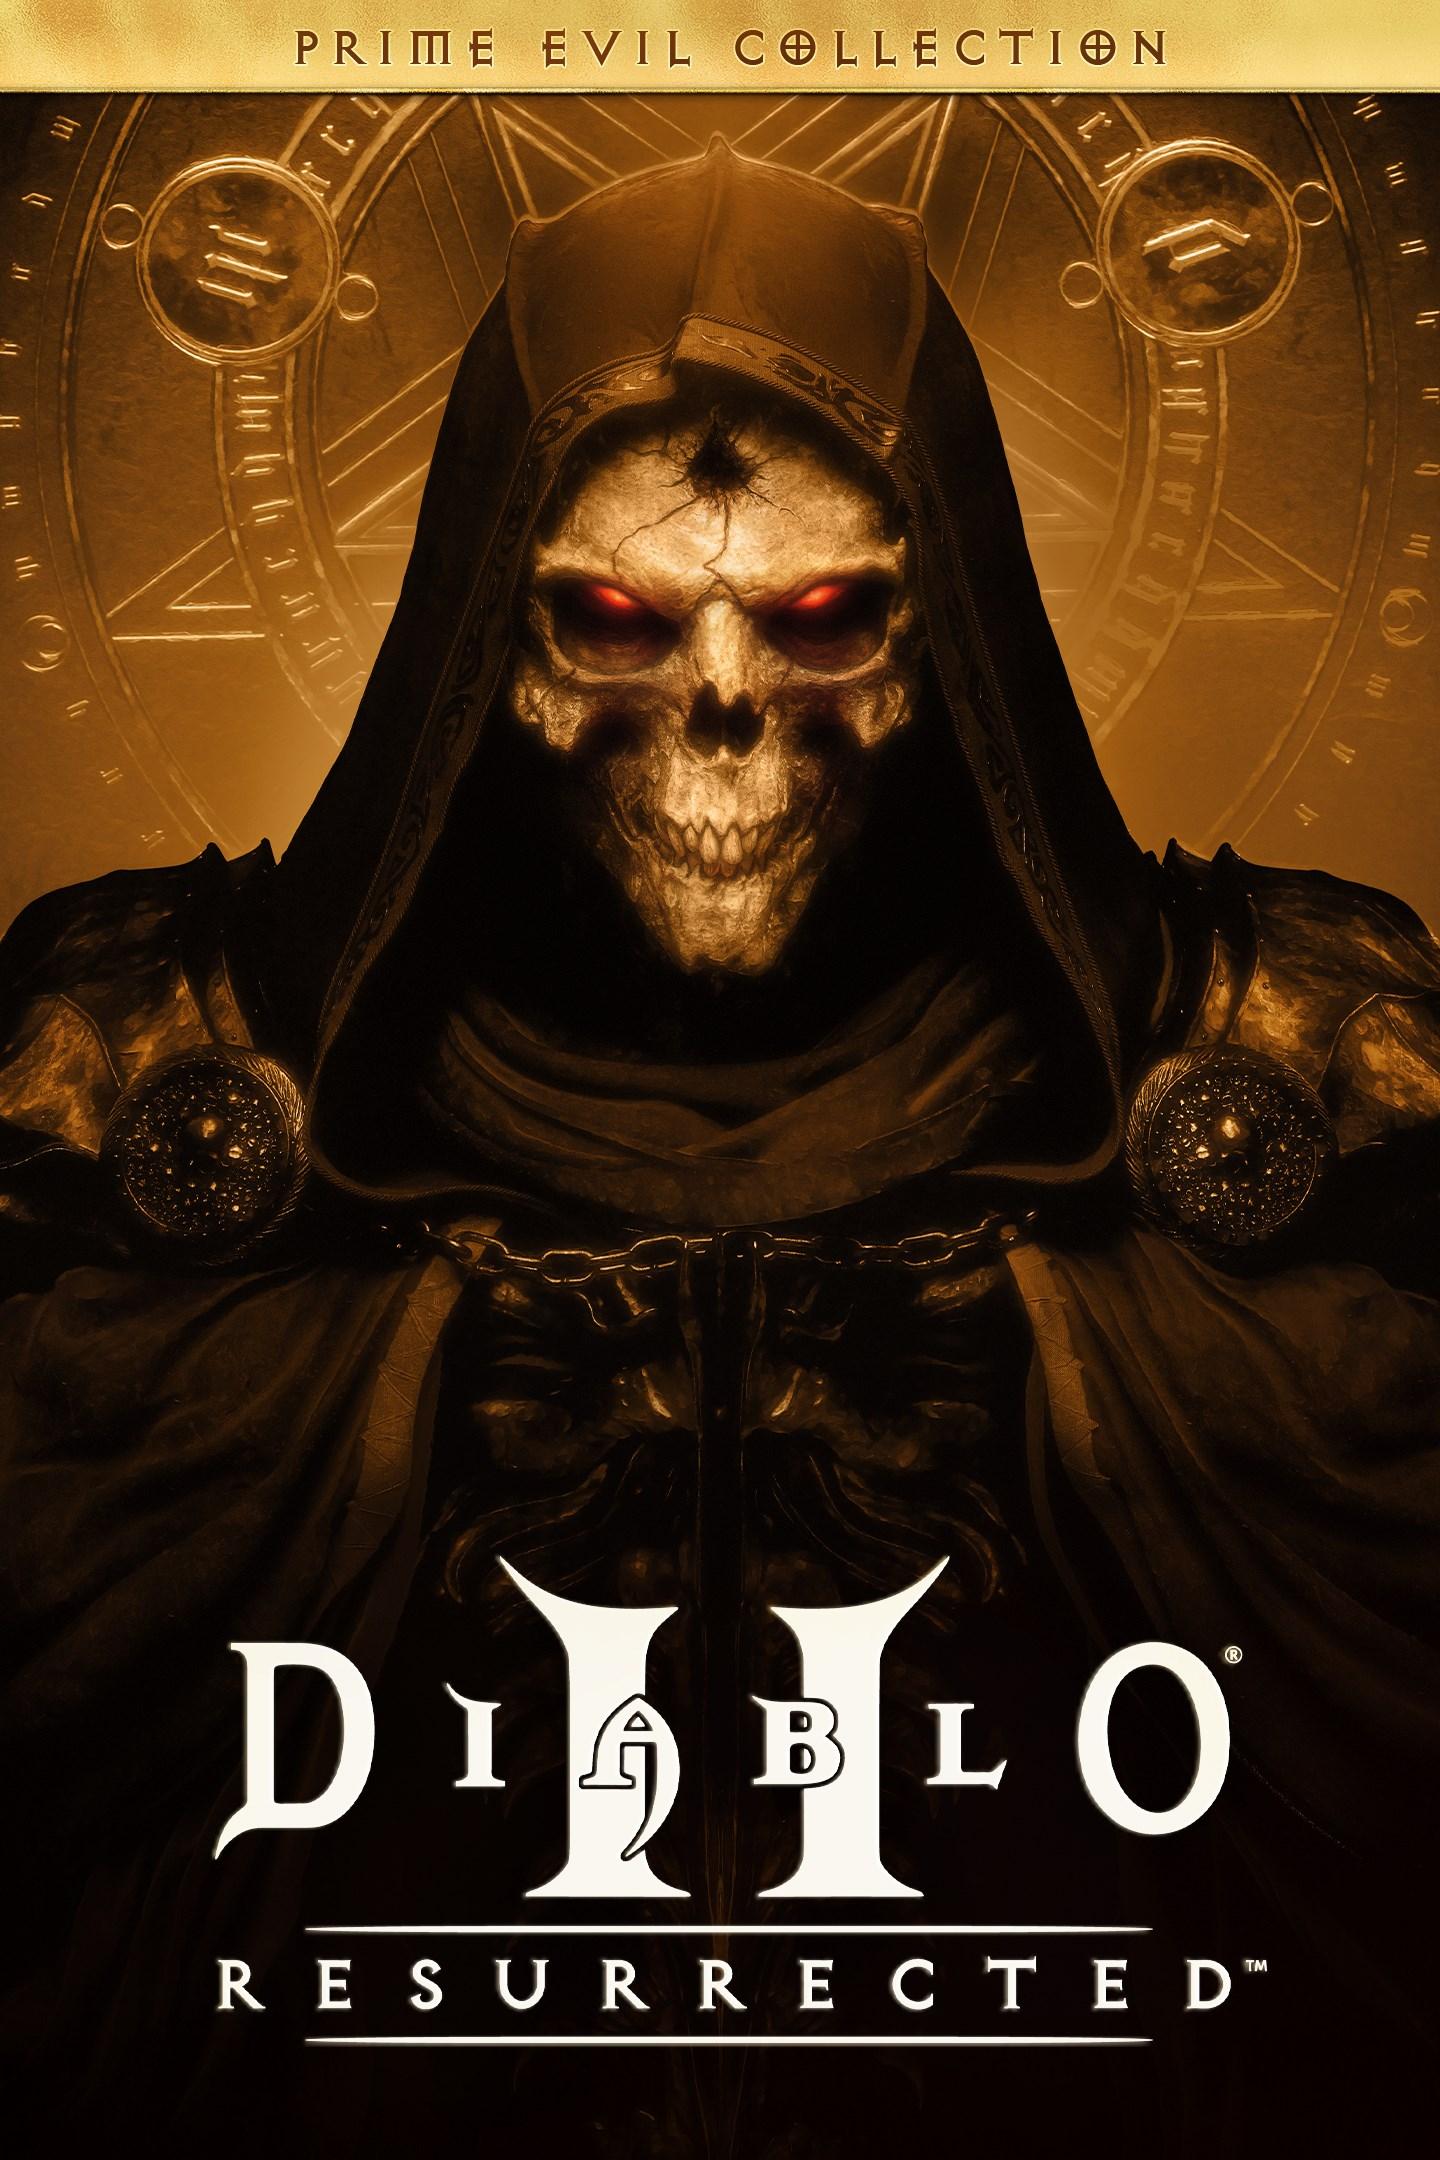 Diablo-2-Resurrected-Serial-Key-Generator